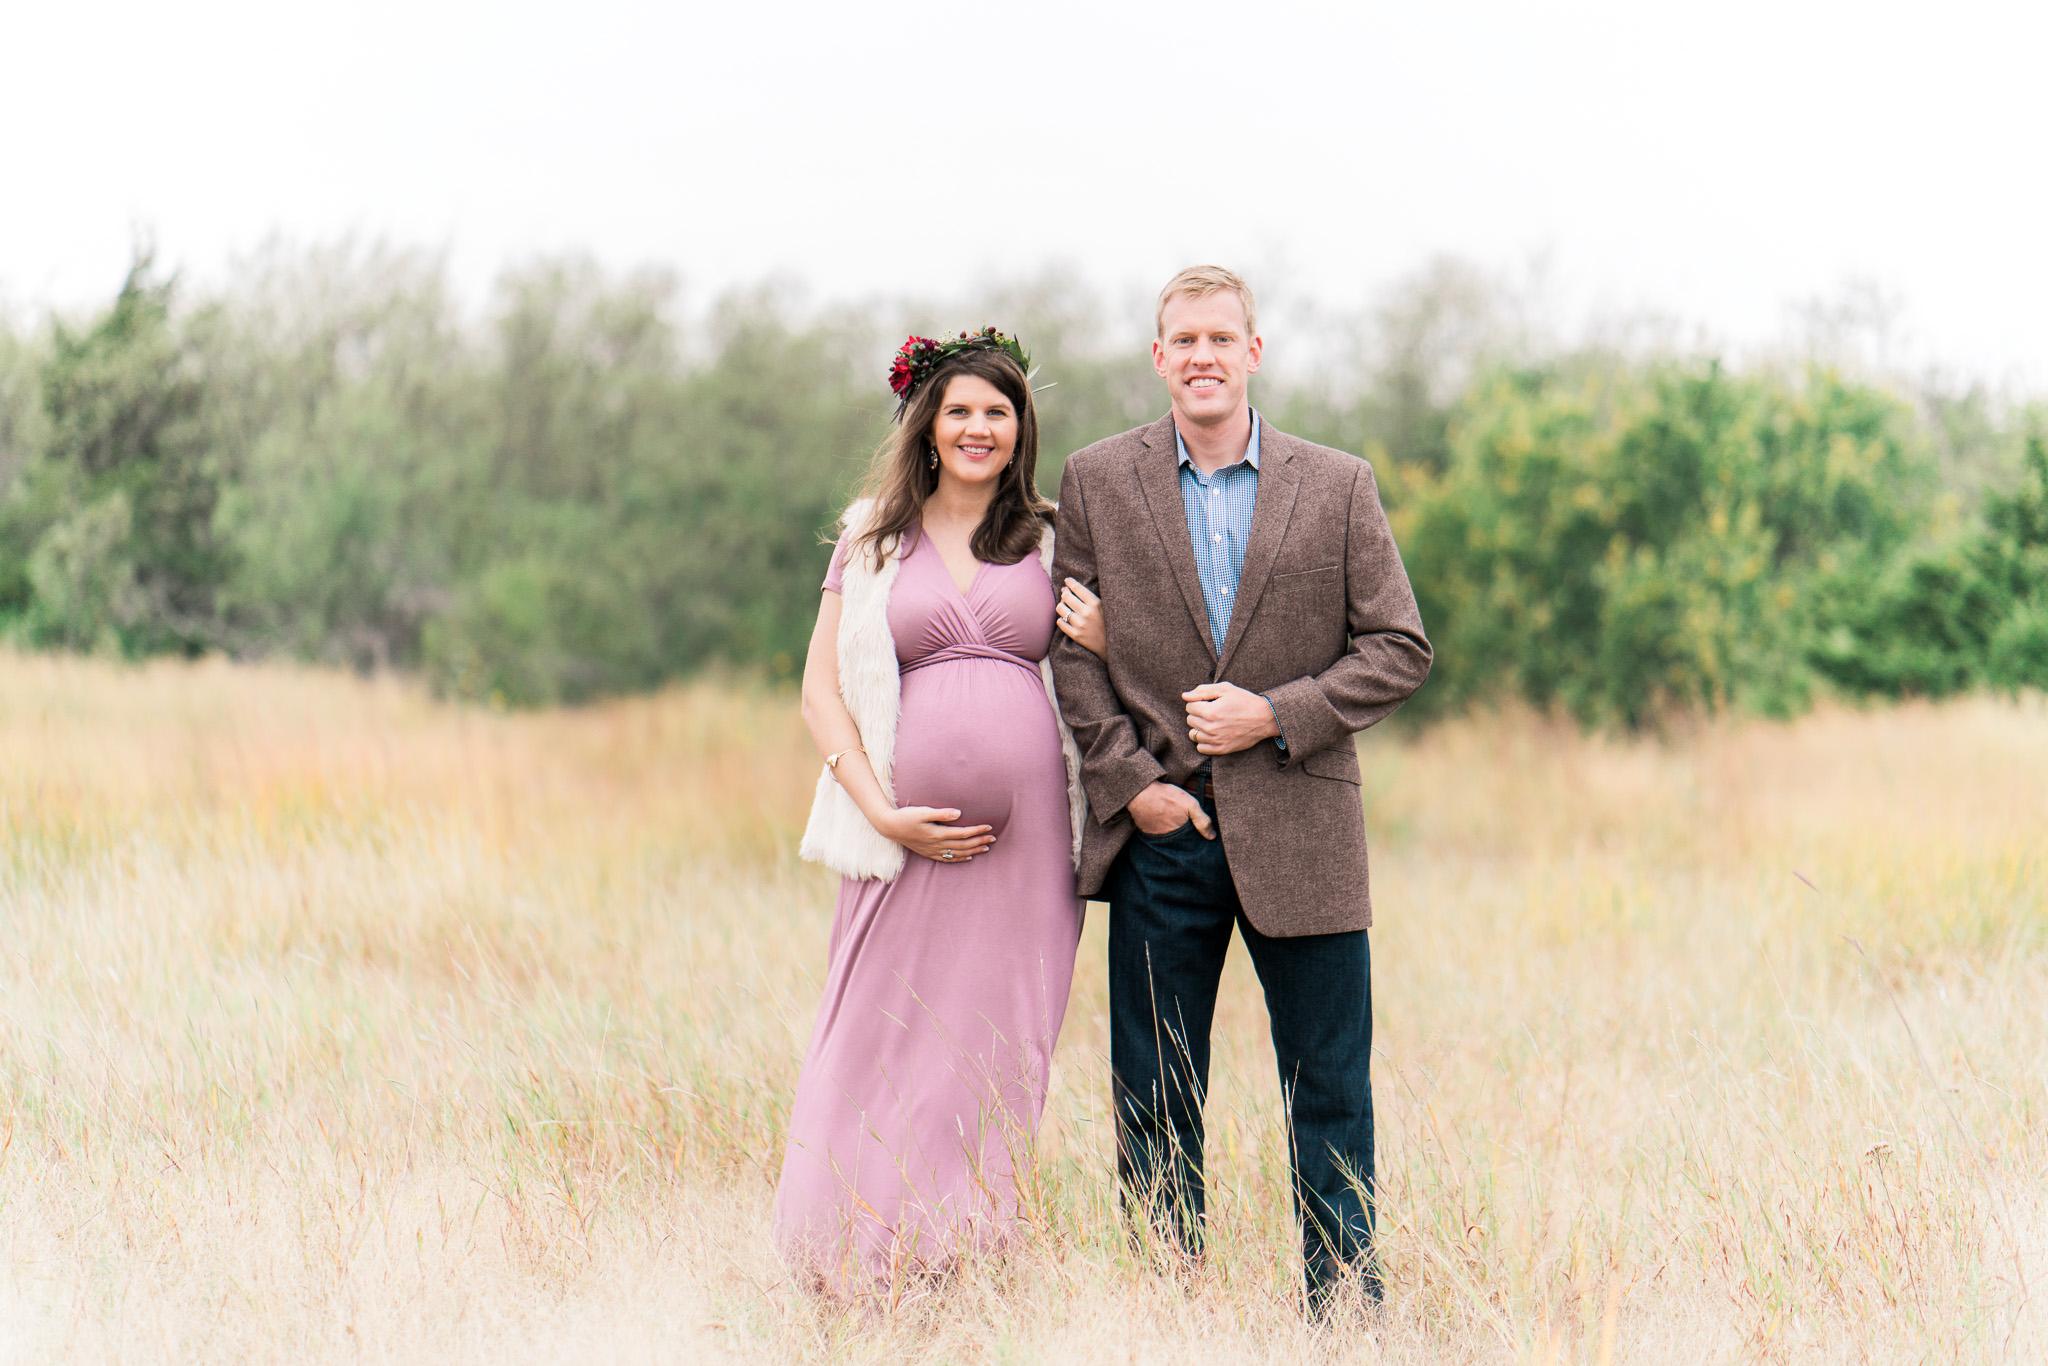 Lizanne-Andrew-Maternity-Kate-Bernard-Photography-Web-30.jpg